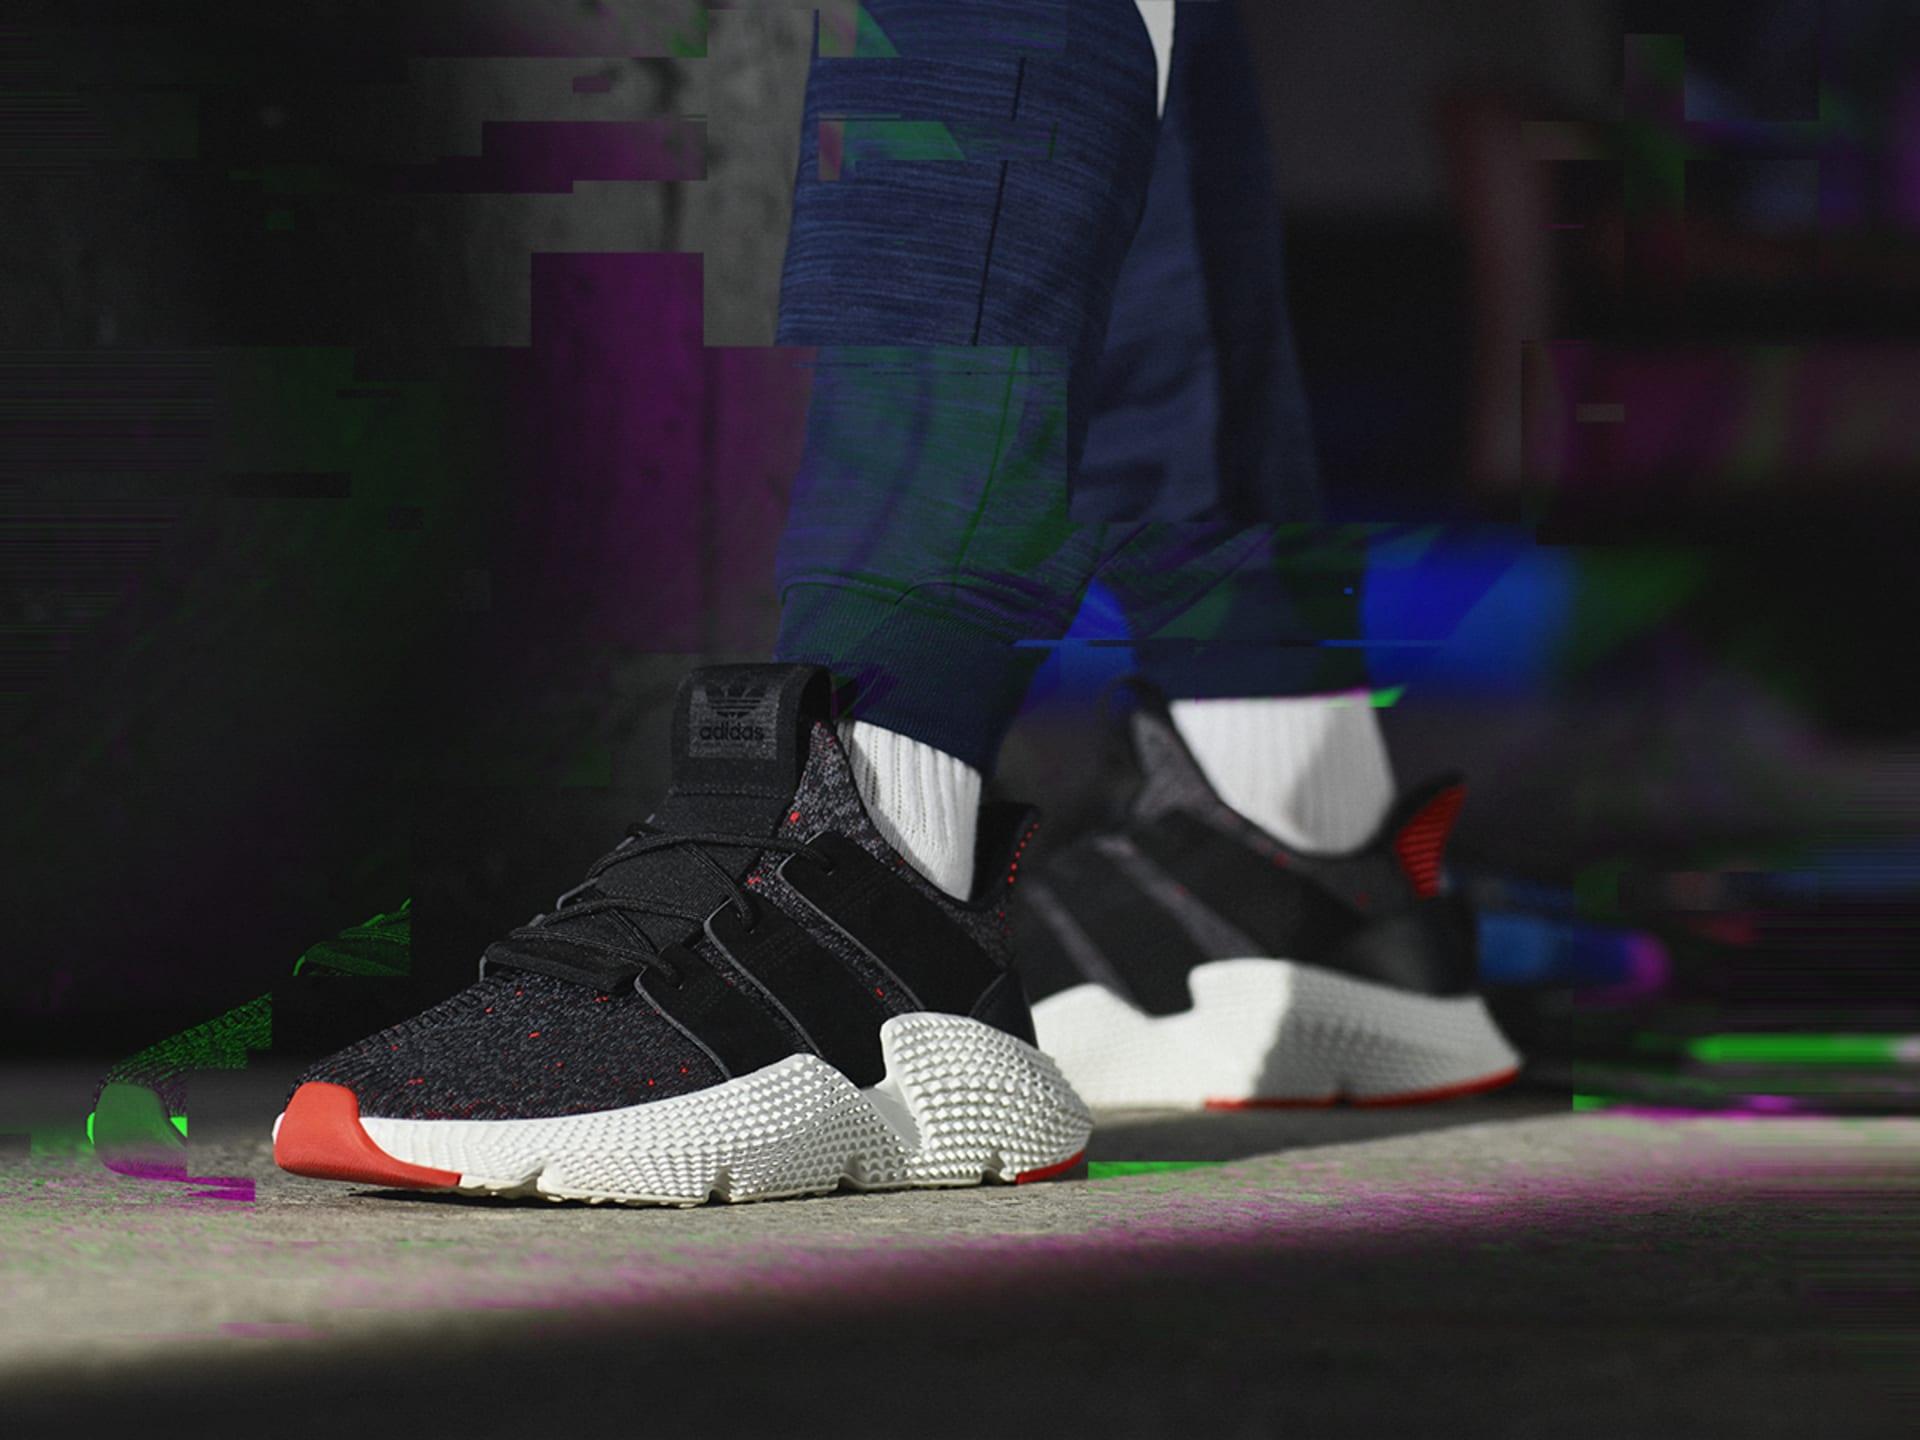 f4b364b1b adidas Originals and Foot Locker in Europe Drop a New Silhouette ...